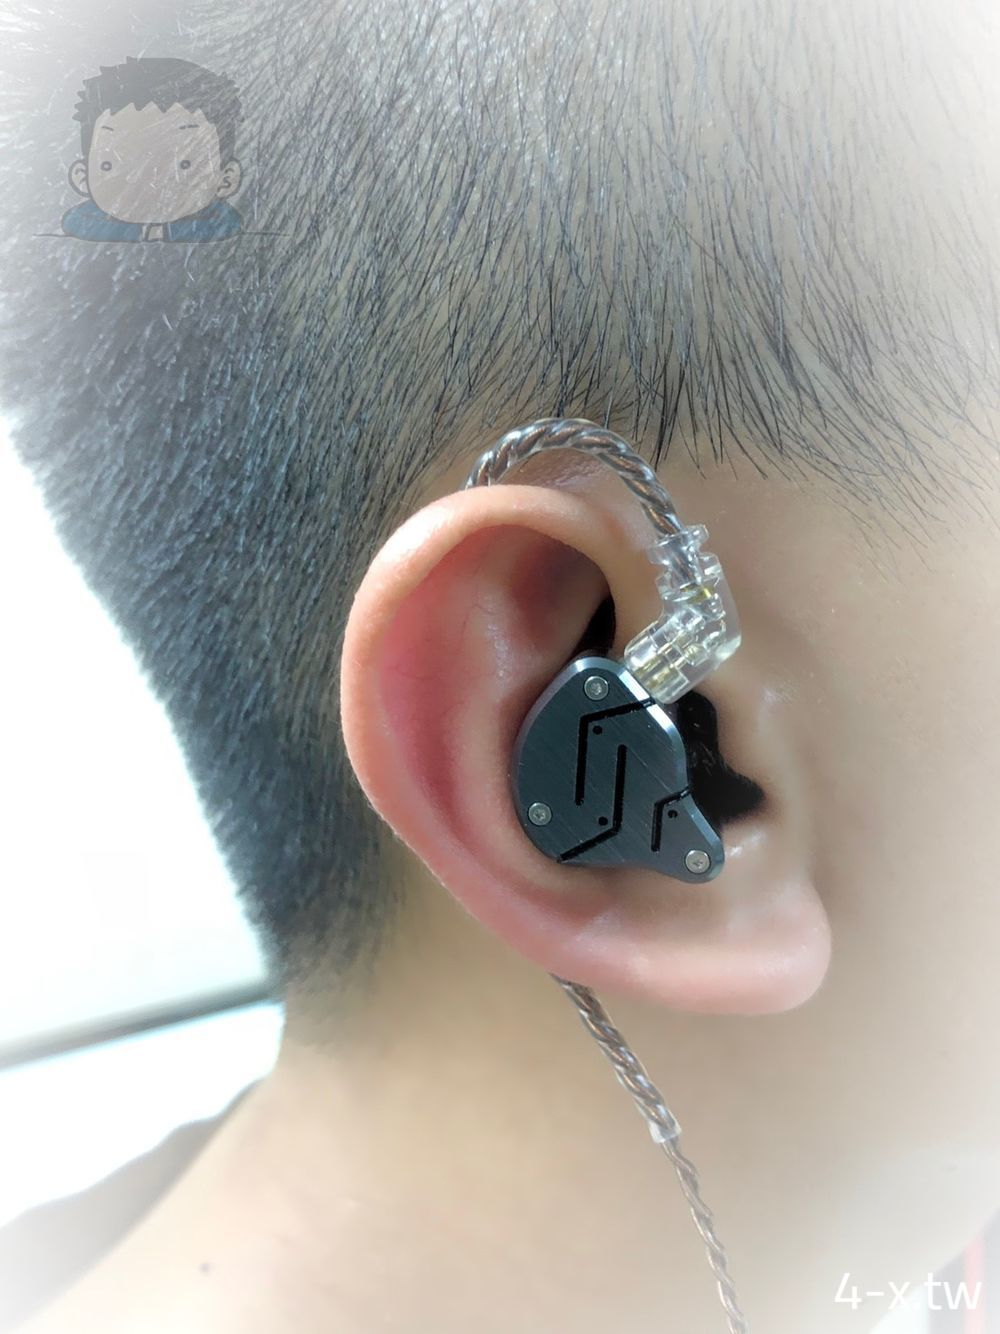 KZ ZSN 耳機實際配戴狀況(右耳)